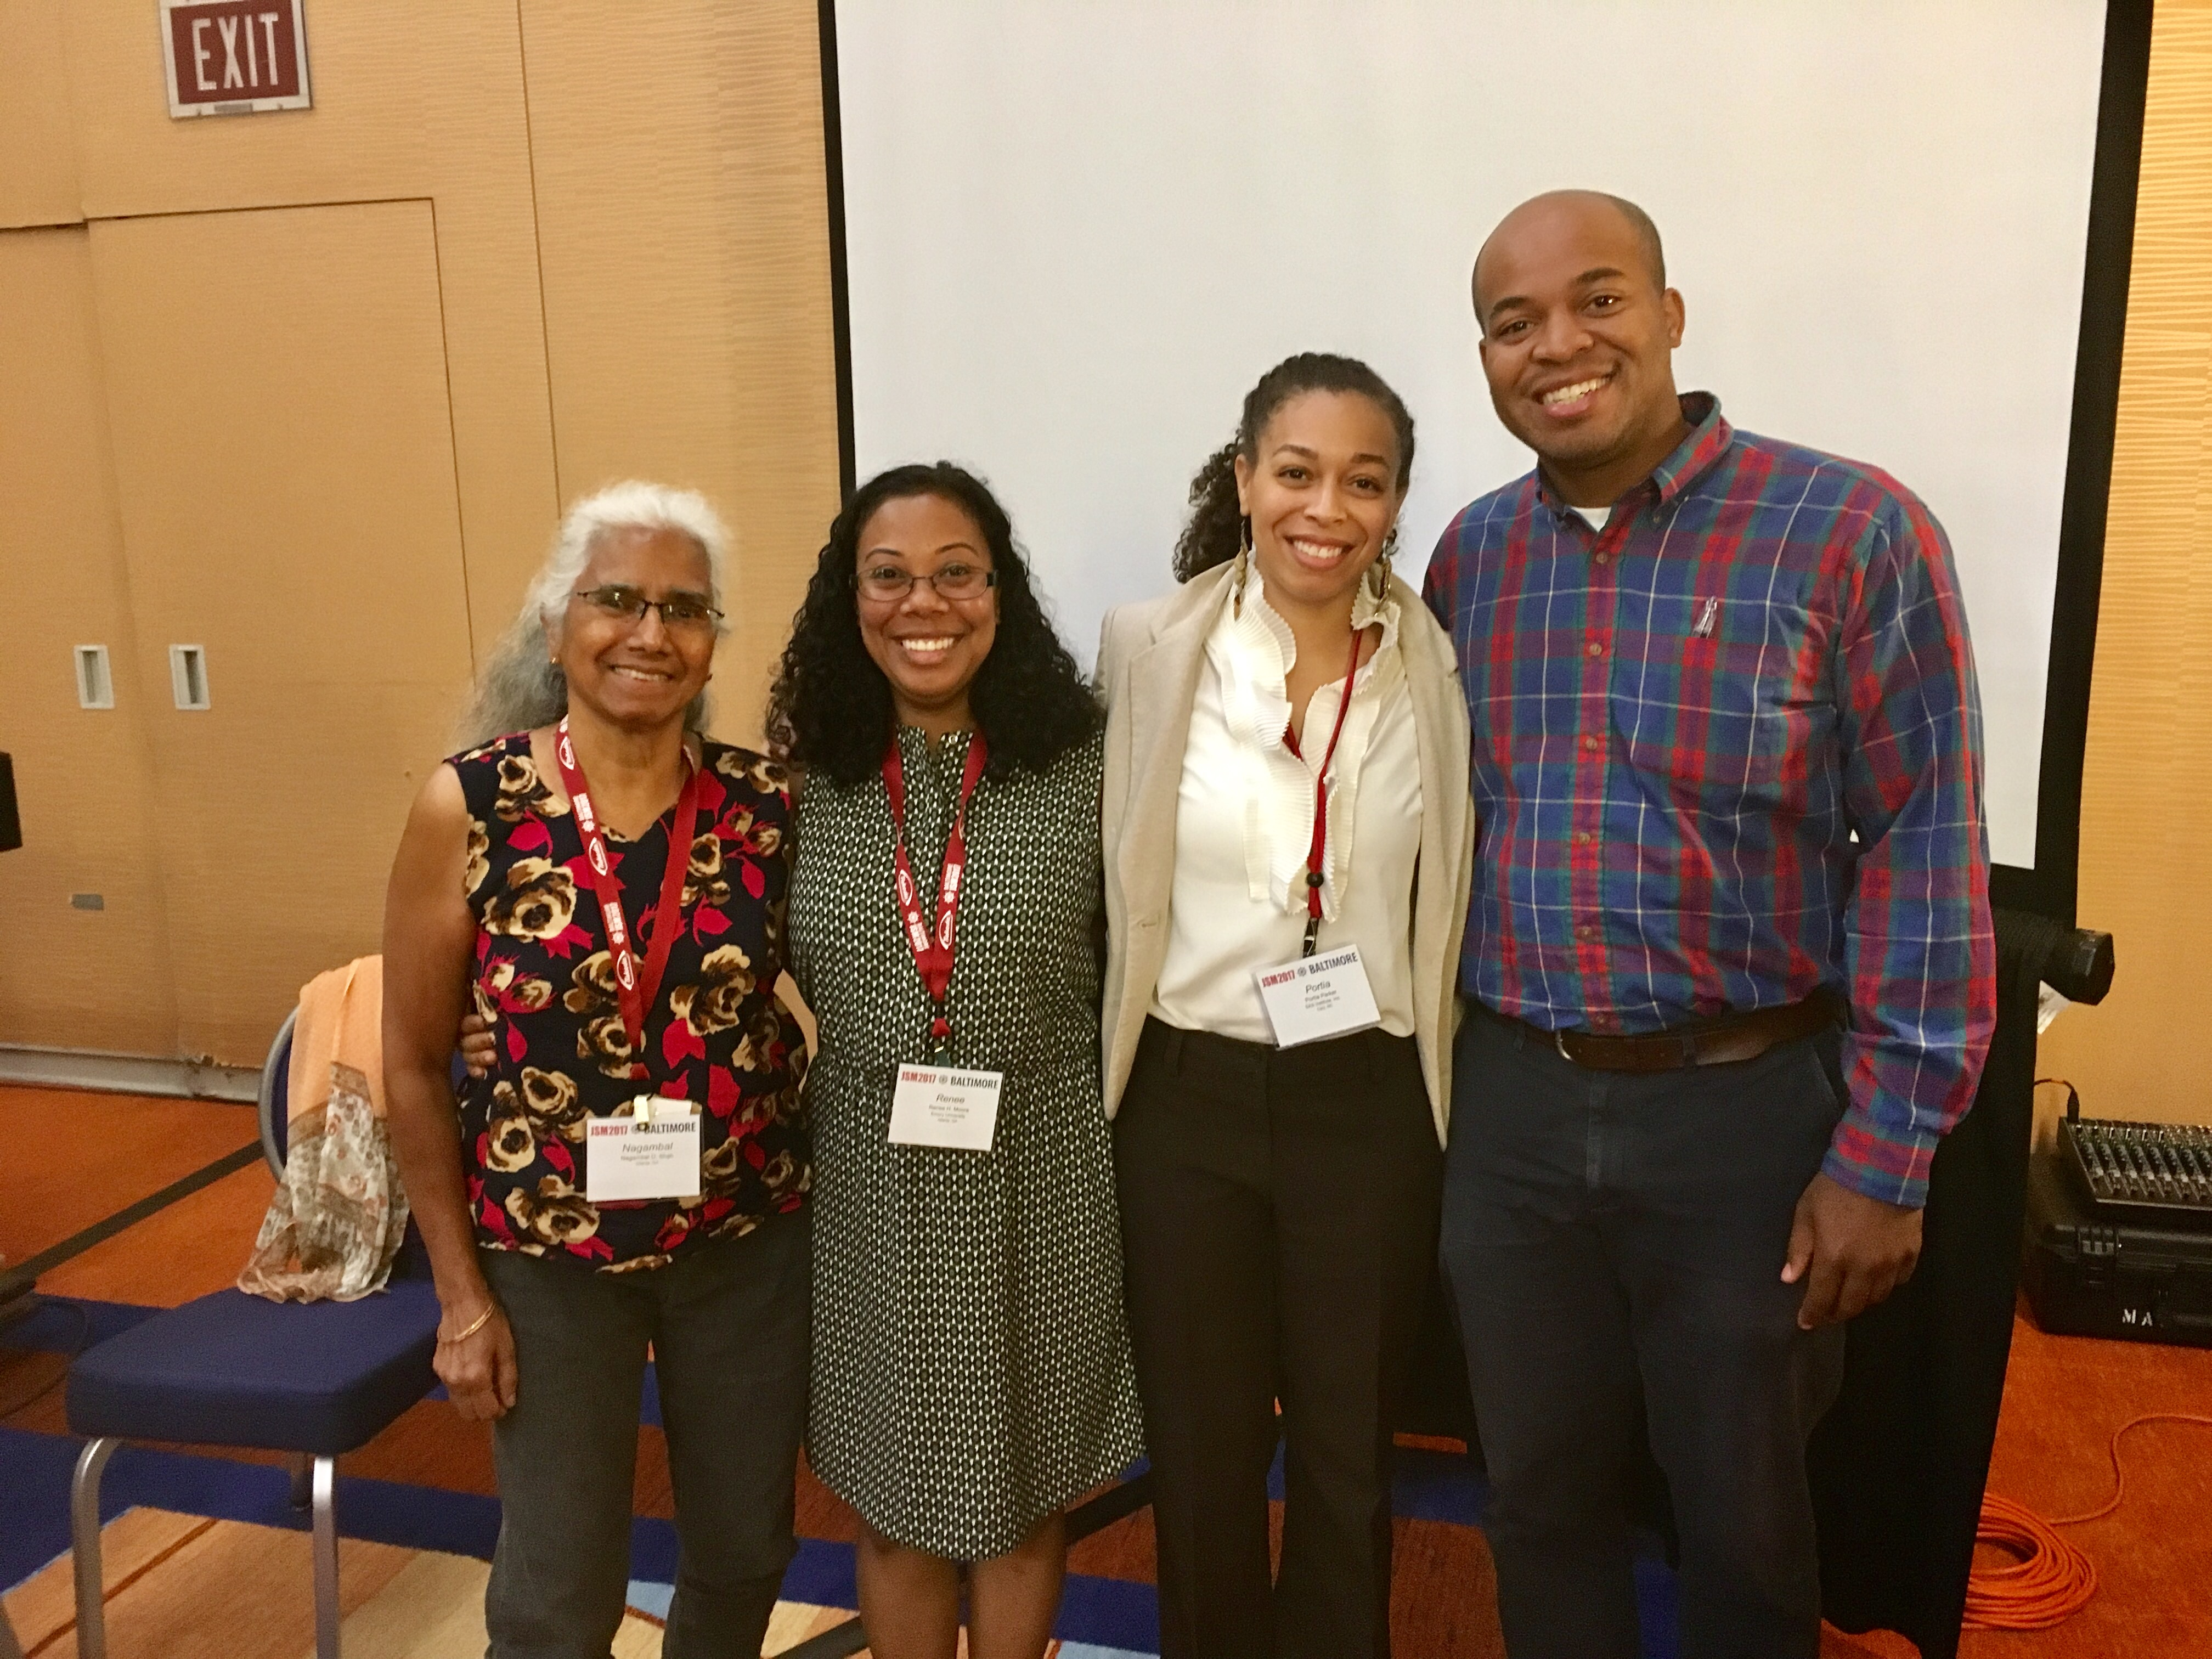 Nagambal Shah, Reneé Moore, Portia Parker, and Michael Sampson